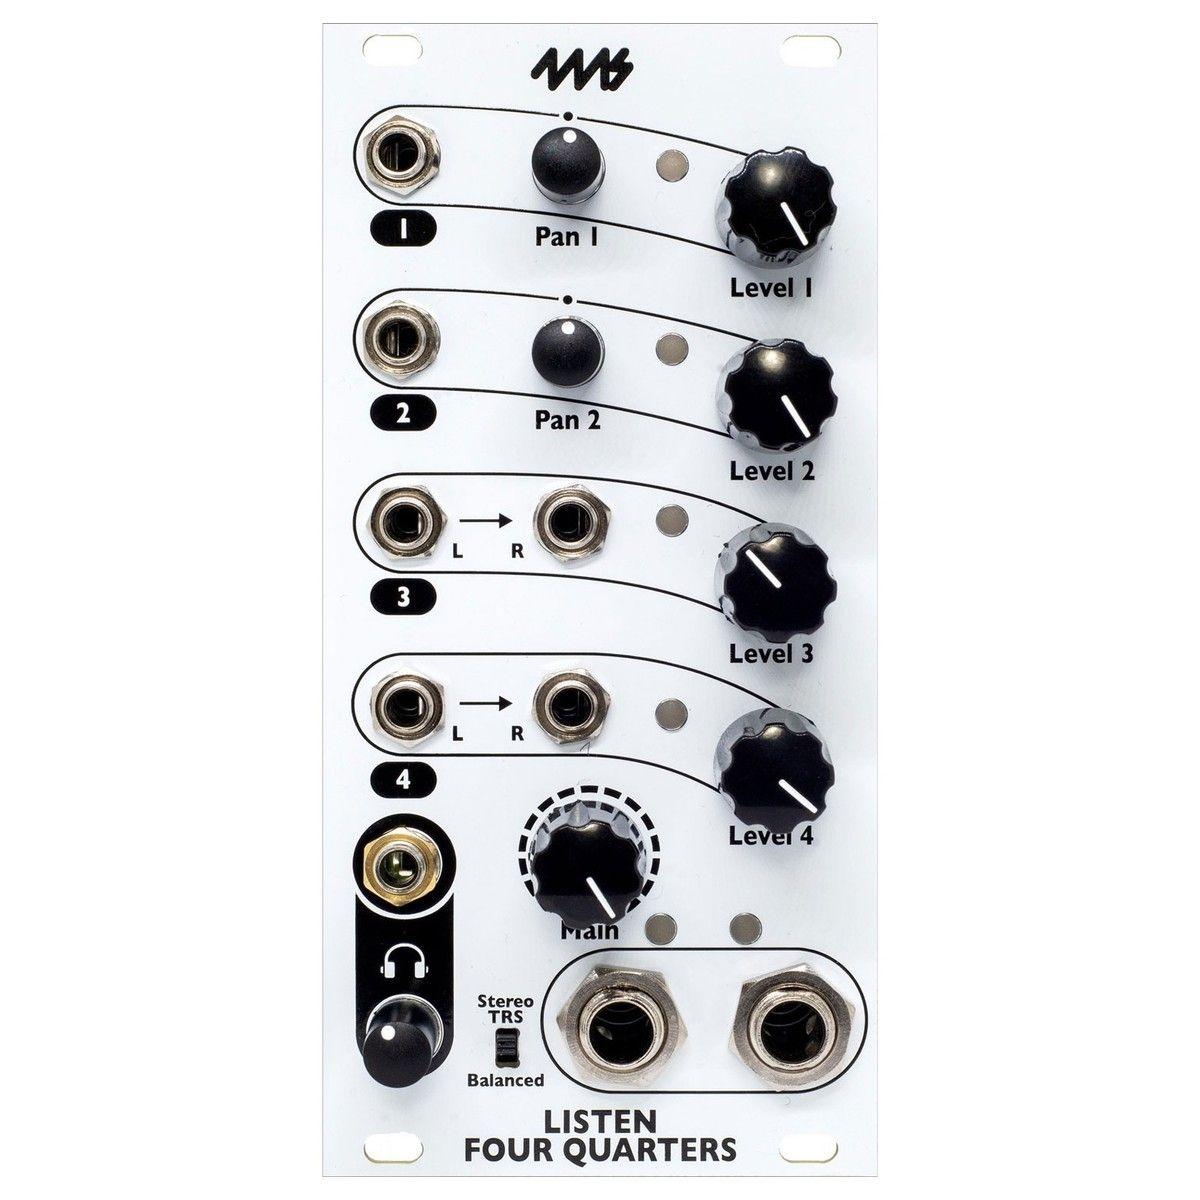 4ms Listen 4 Quarters Eurorack Audio Interface Module